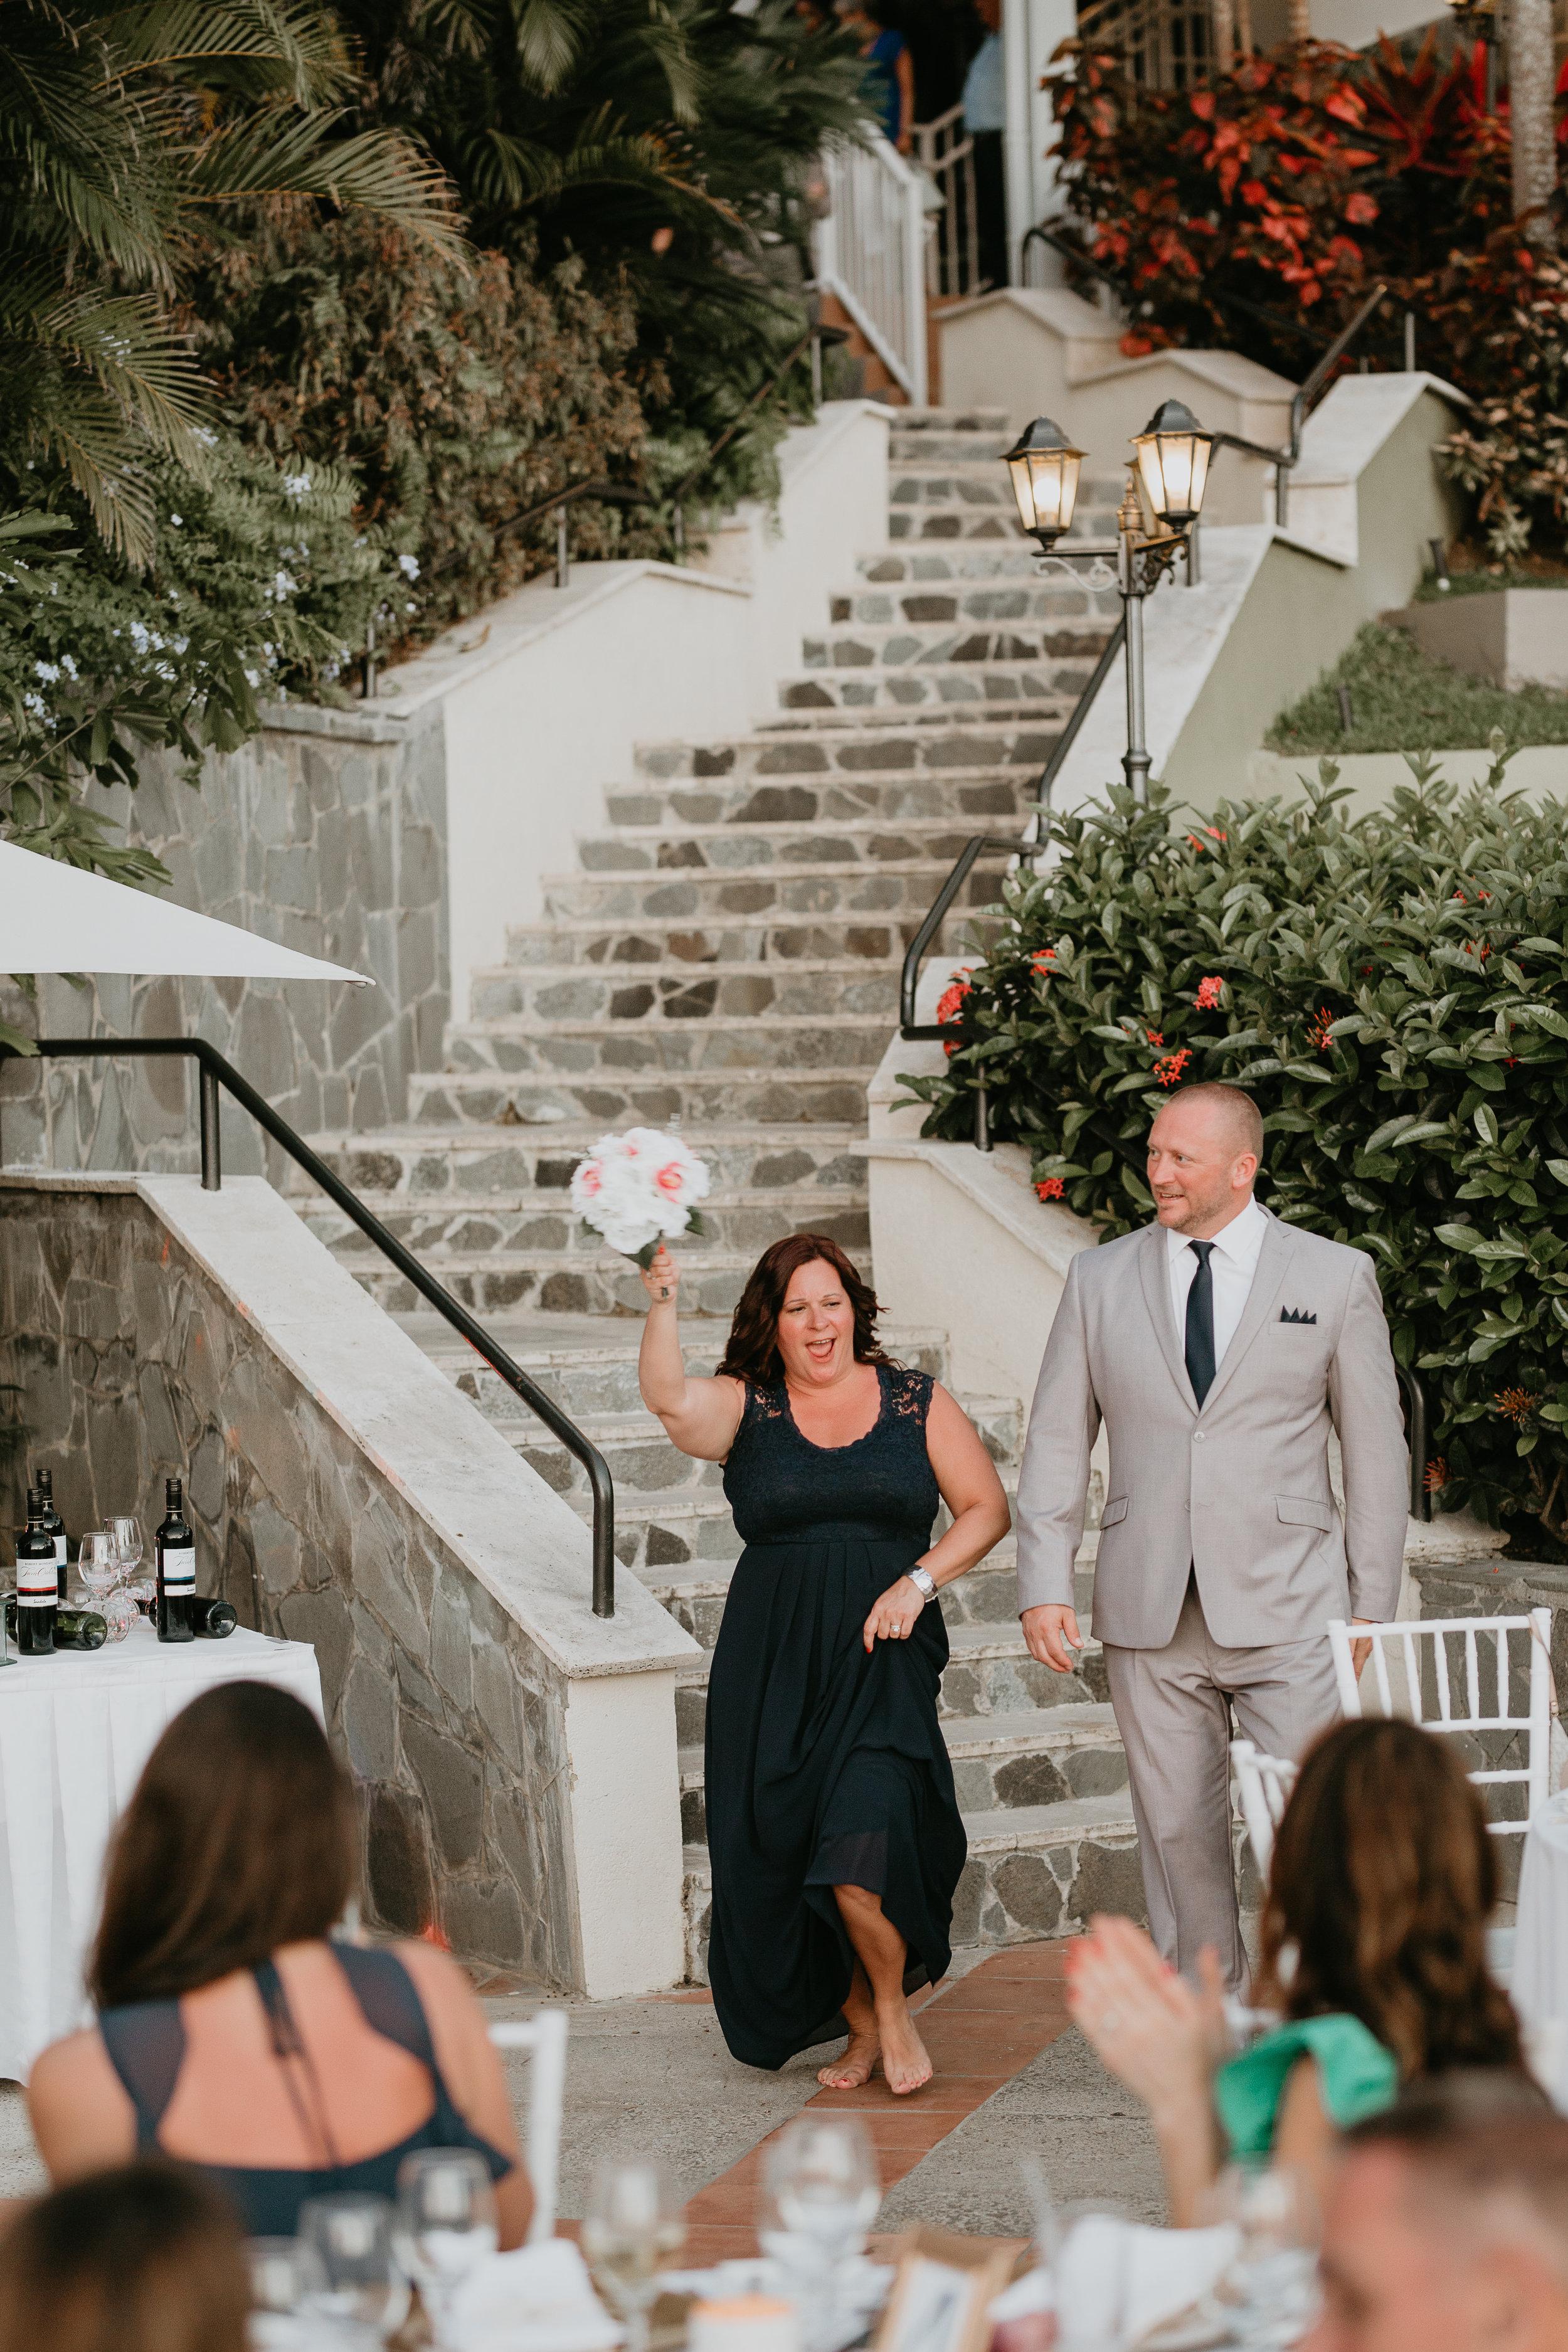 nicole-daacke-photography-destination-wedding-in-st-lucia-sandals-la-toc-intimate-island-wedding-carribean-elopement-photographer-chill-island-wedding-125.jpg